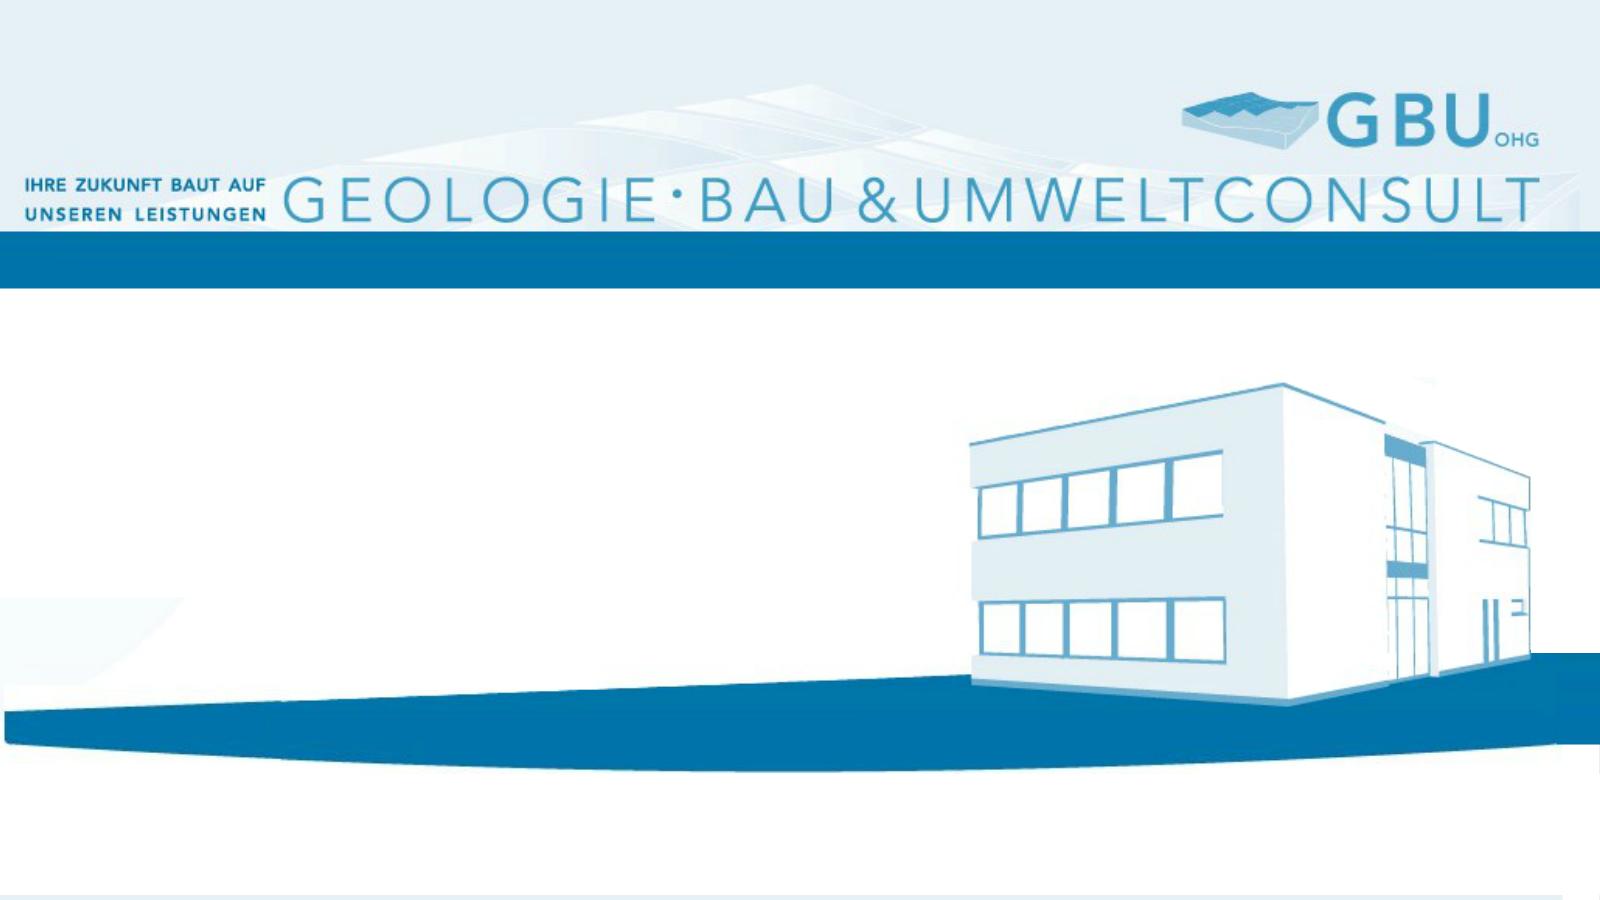 Geologie-, Bau- & Umweltconsult GBU oHG